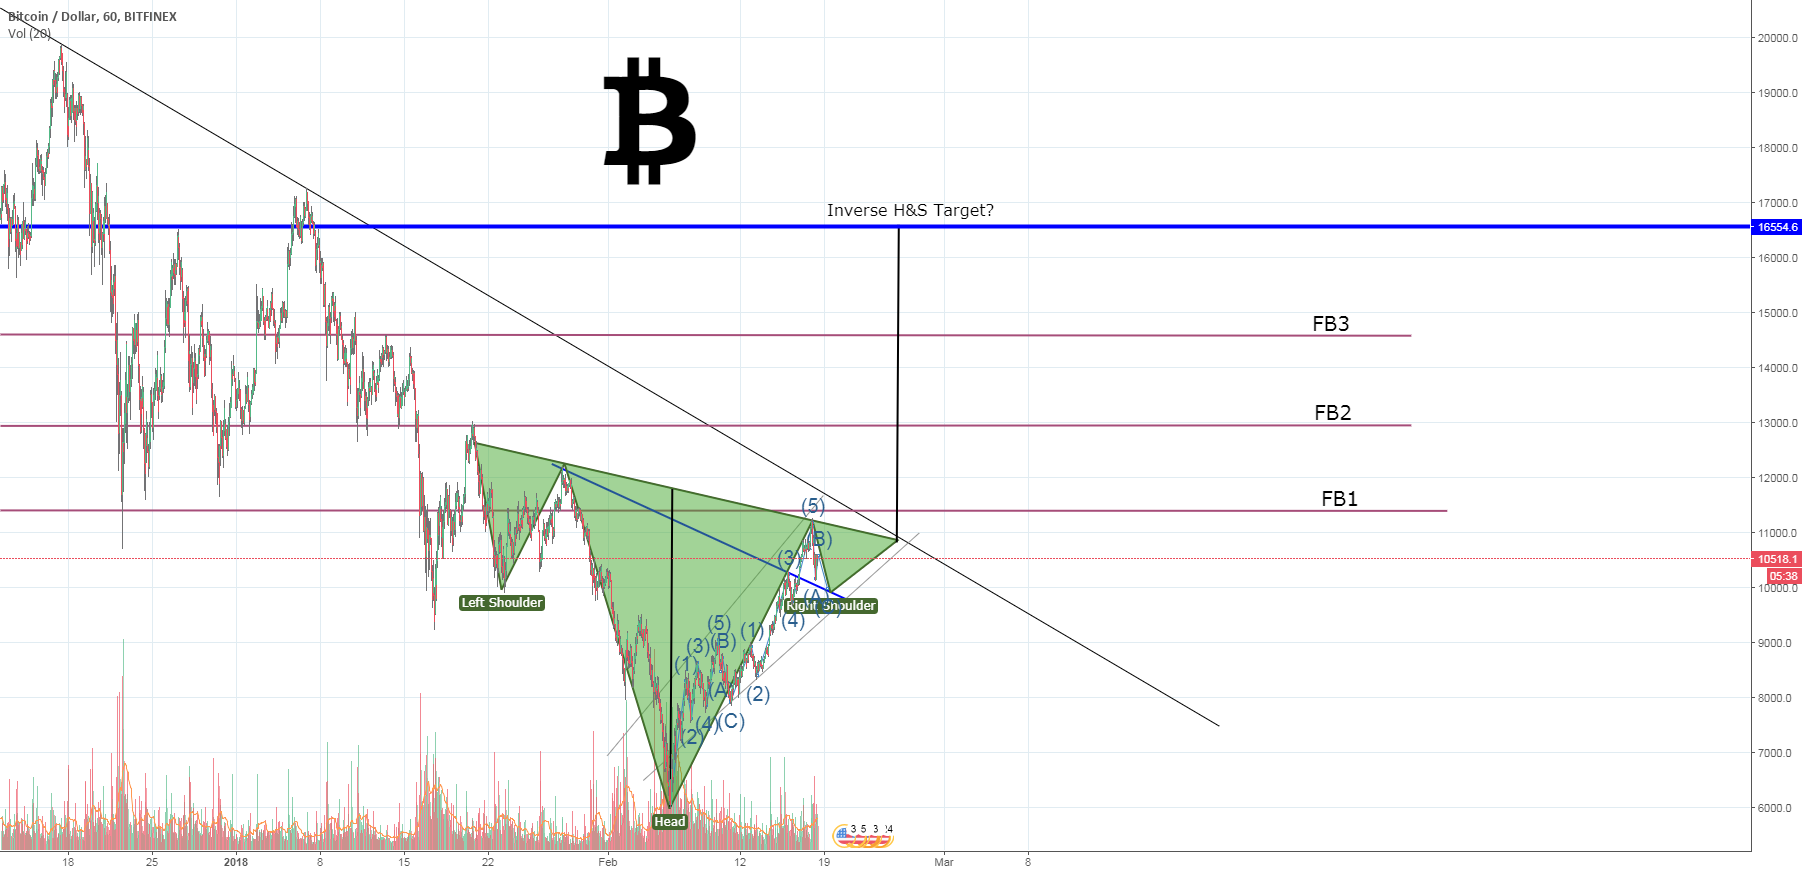 BTC - possible inverse Head&Shoulders forming?